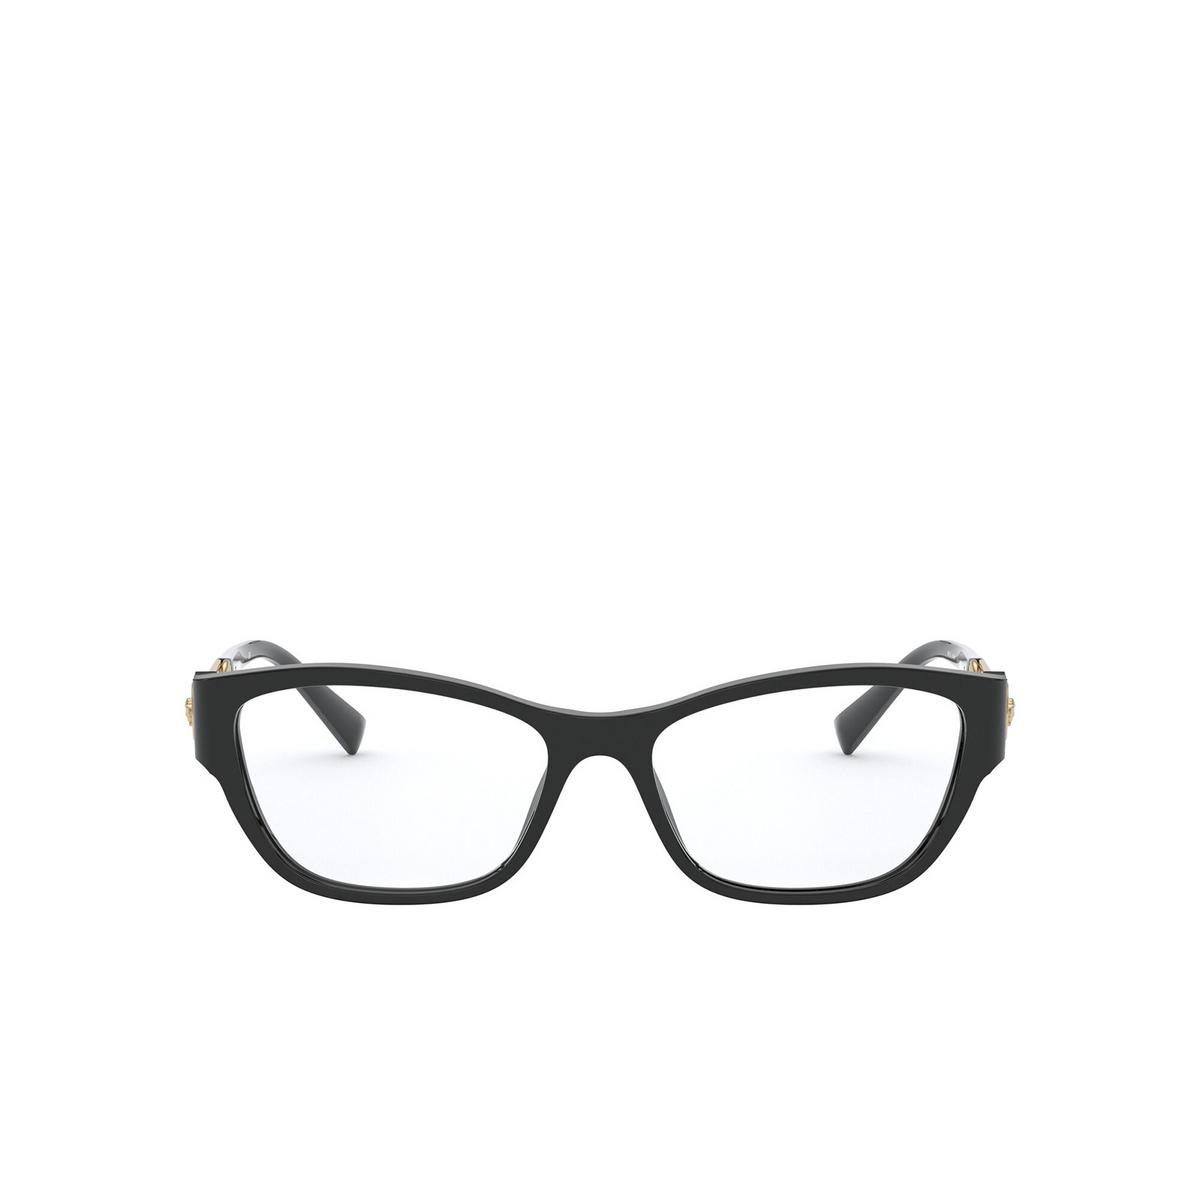 Versace® Cat-eye Eyeglasses: VE3288 color Black GB1 - front view.